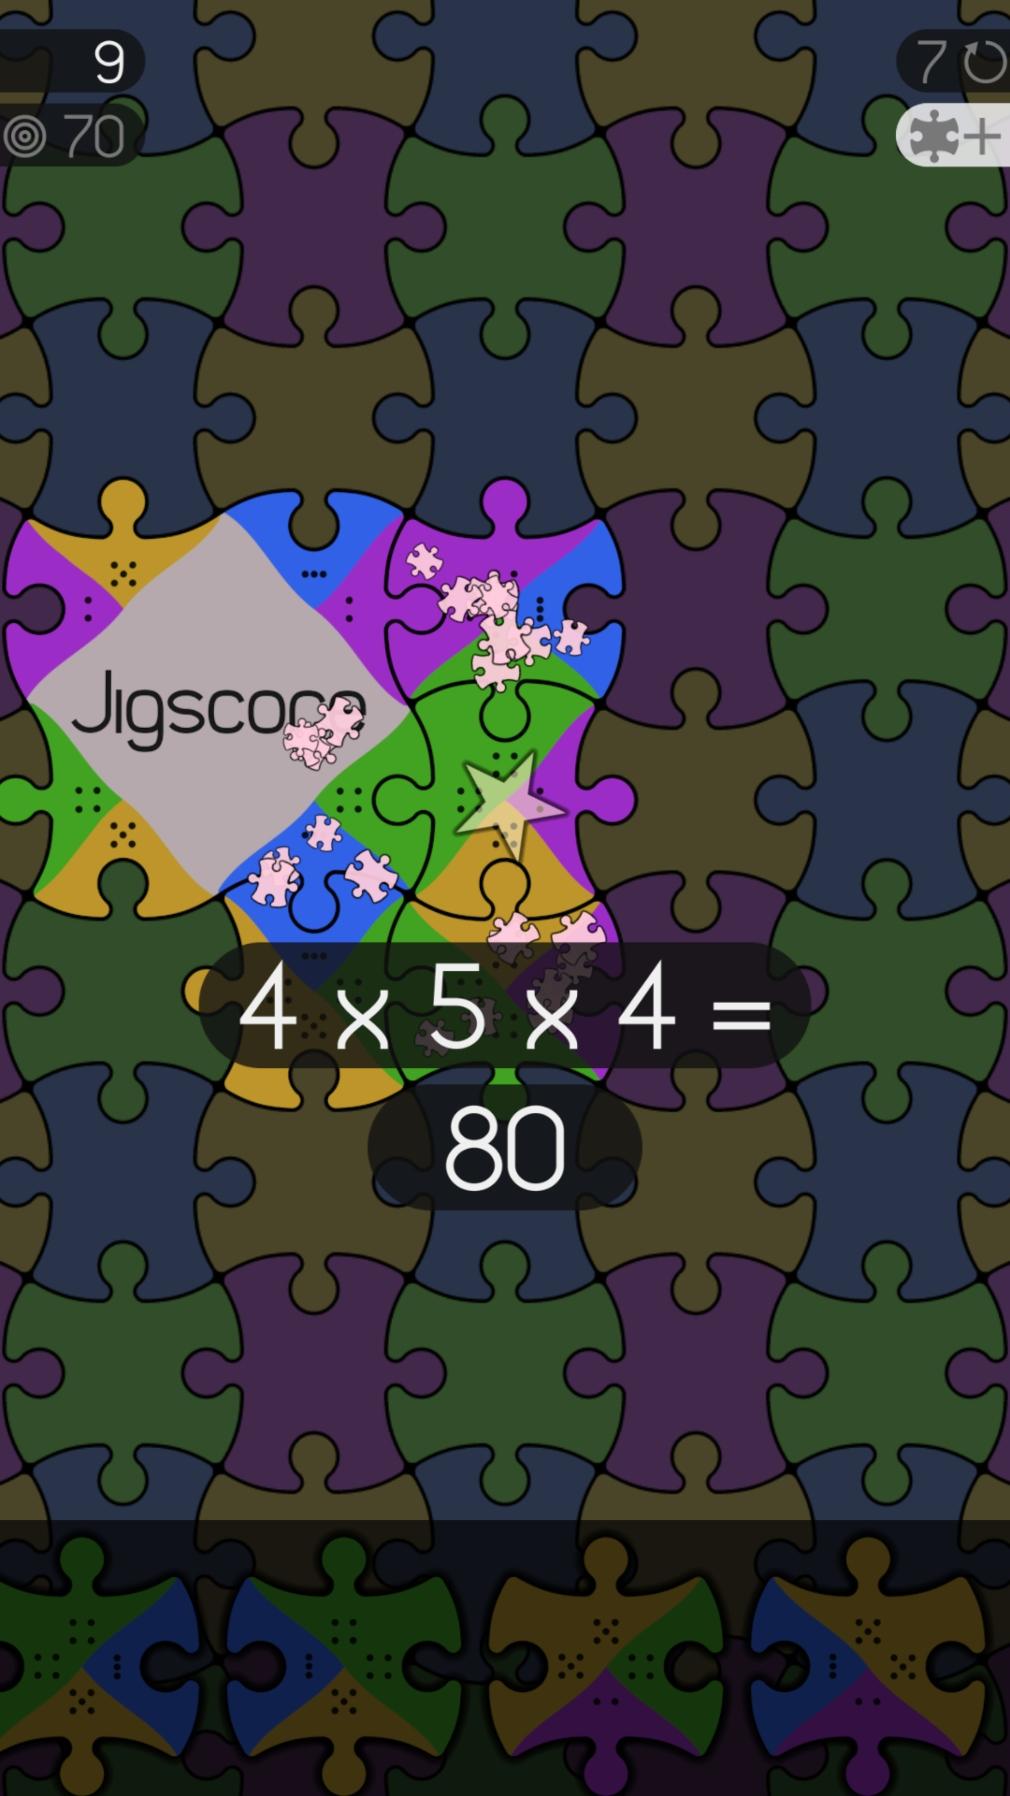 Jigscore icon